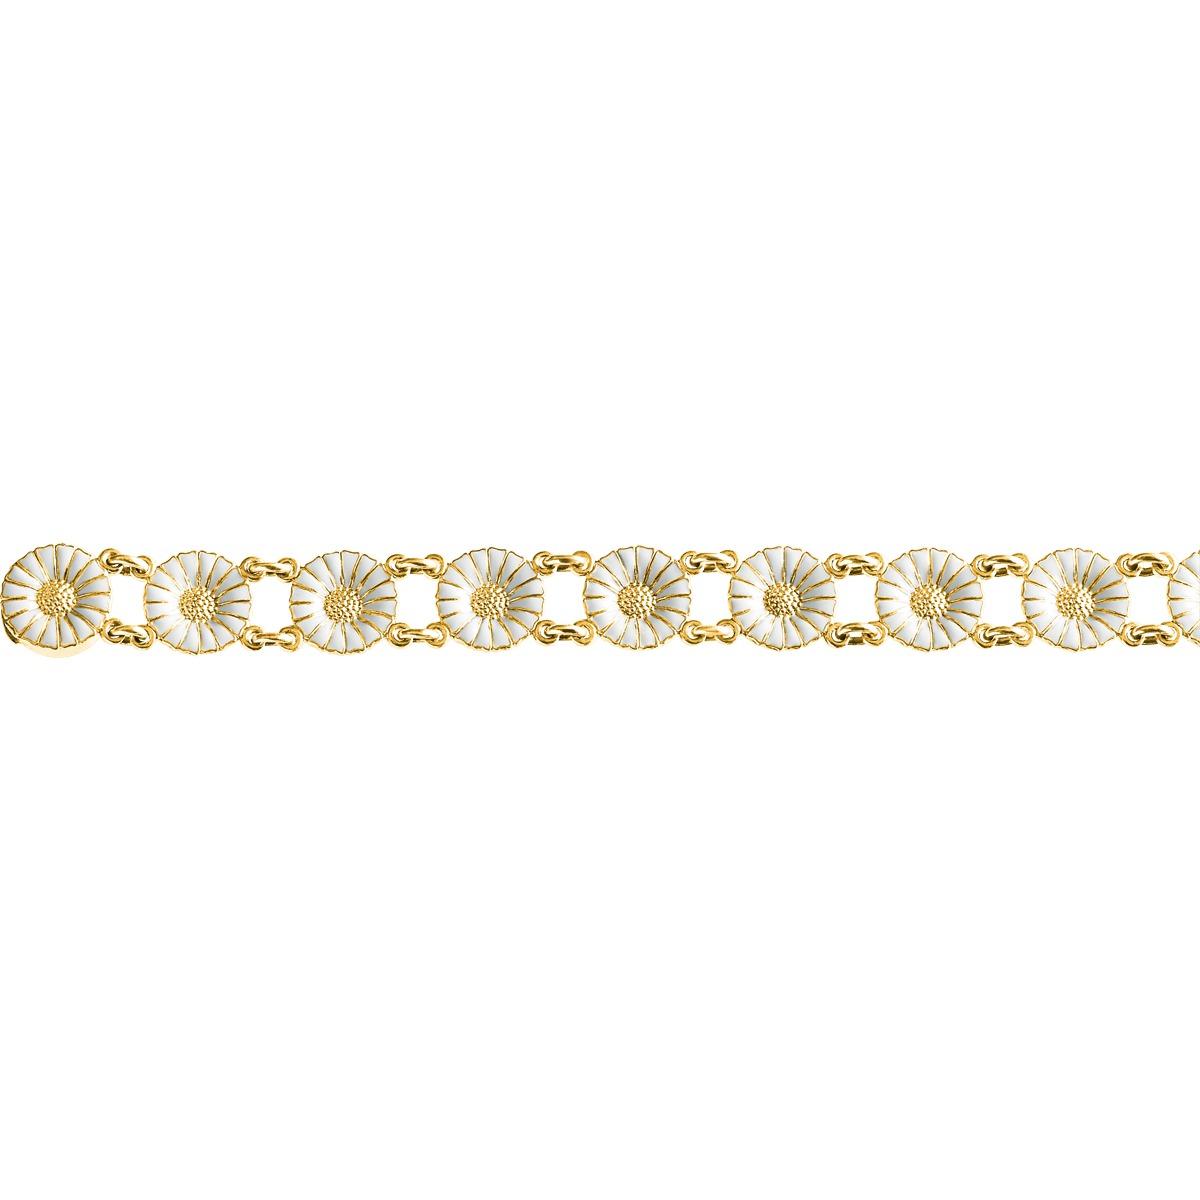 Georg Jensen DAISY armbånd - 3530895 19 centimeter